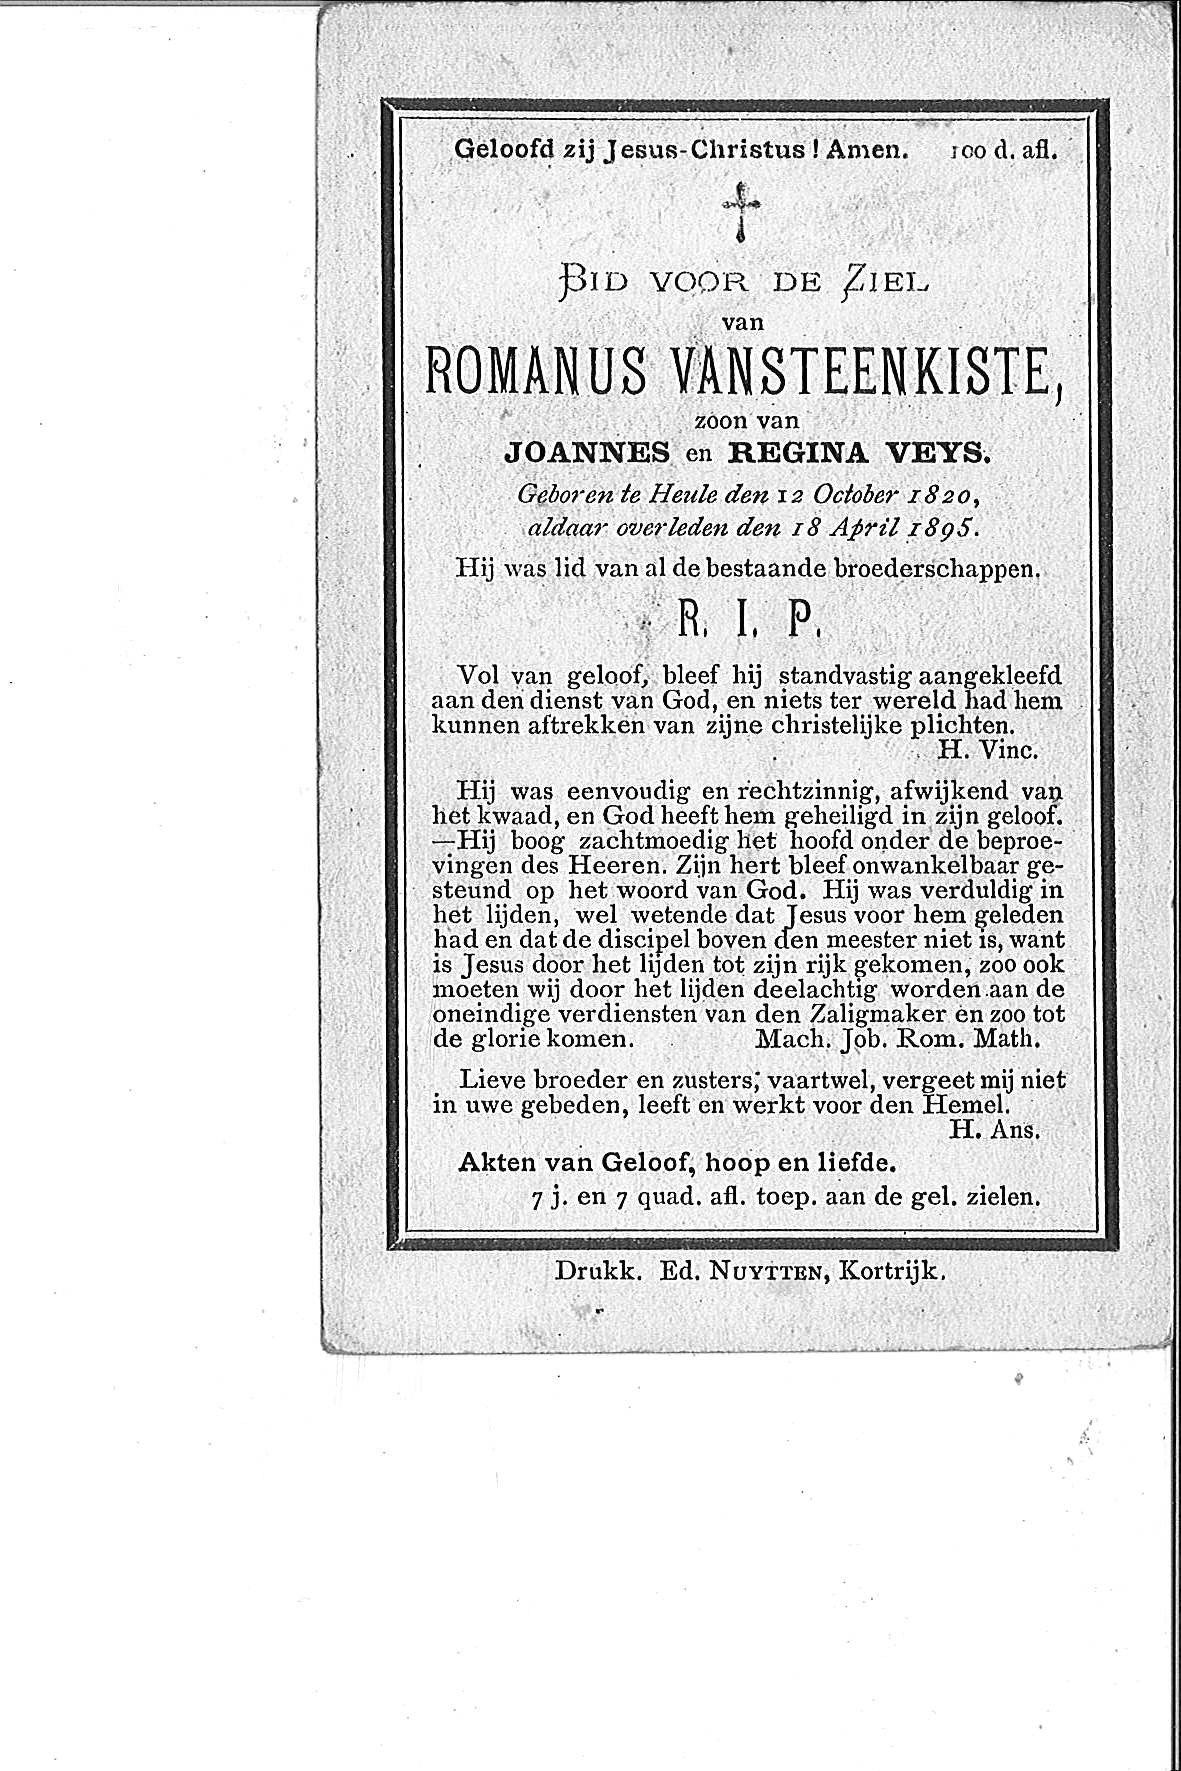 Romanus(1895)20150708084435_00019.jpg